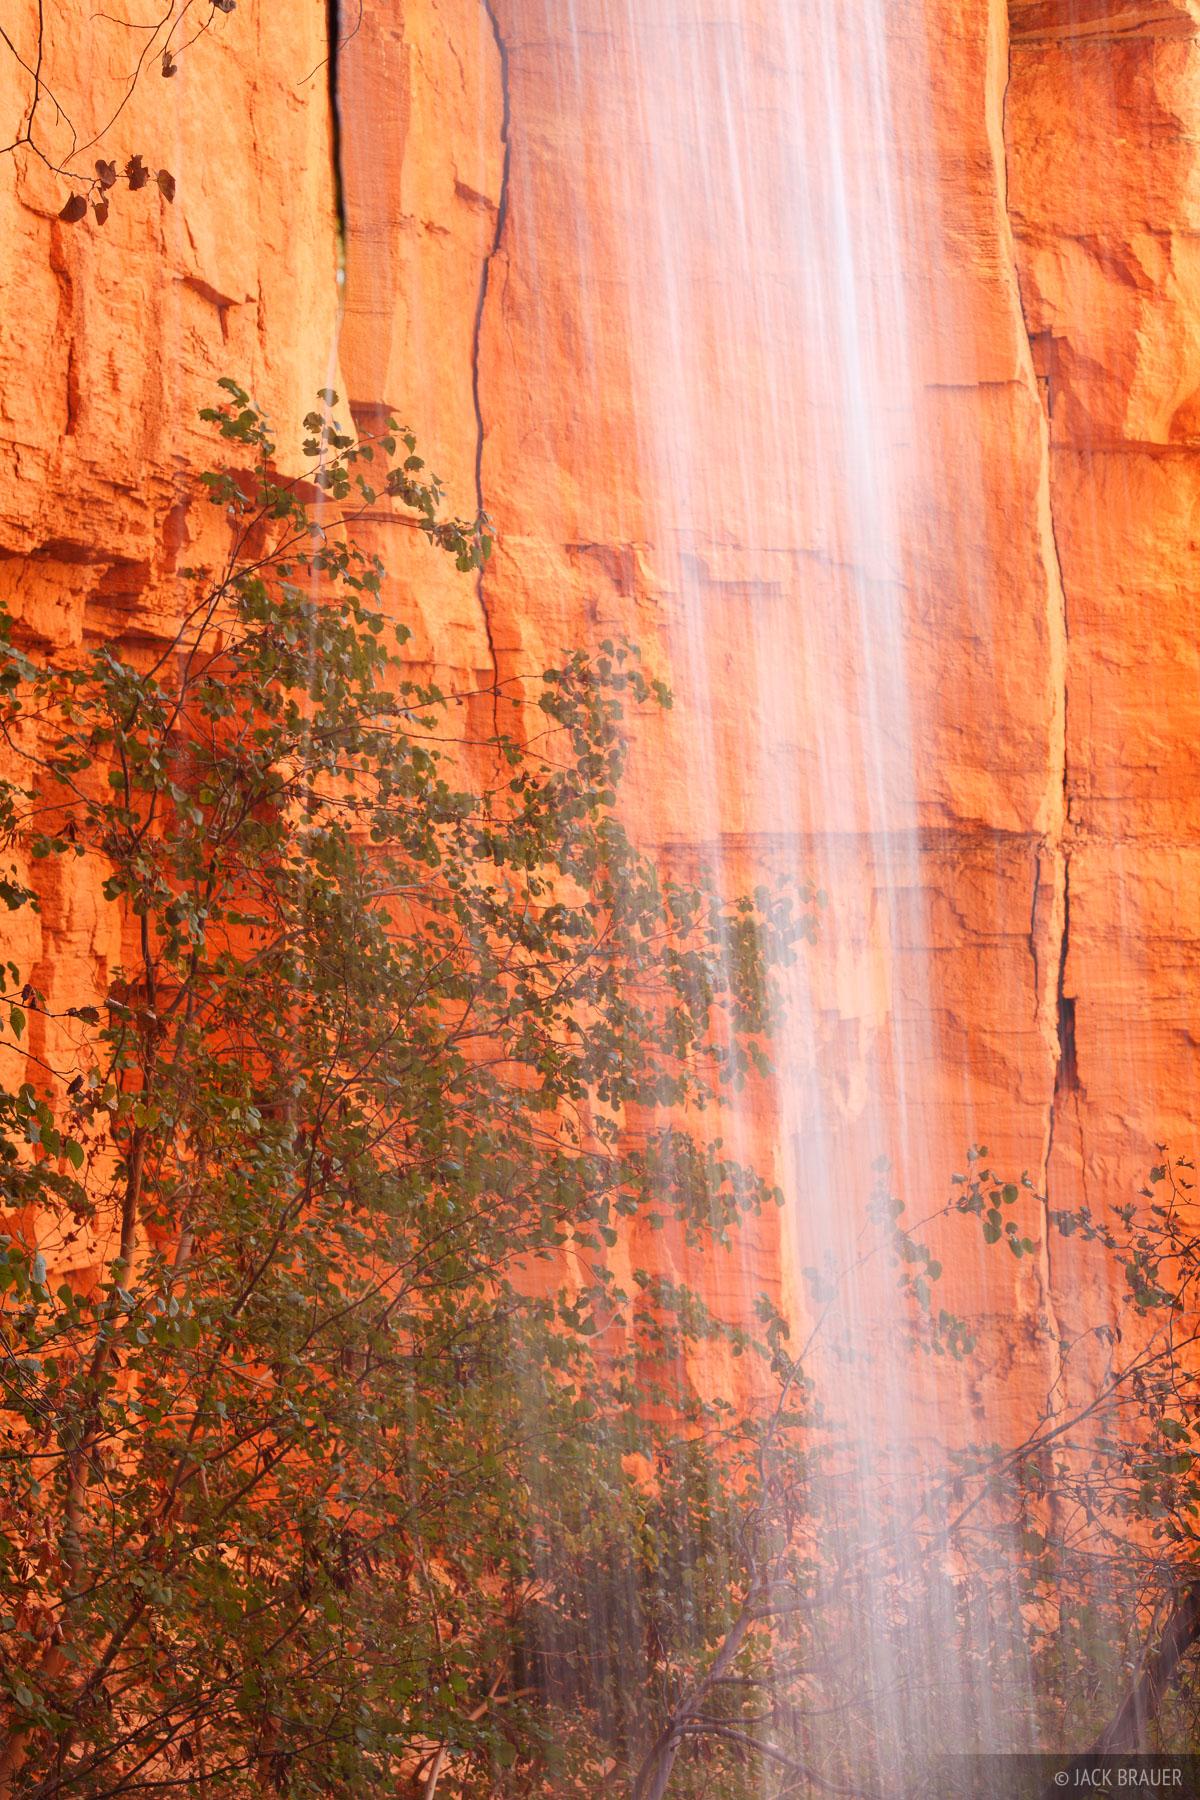 Deer Spring, Grand Canyon, Arizona, abstract, waterfall, photo